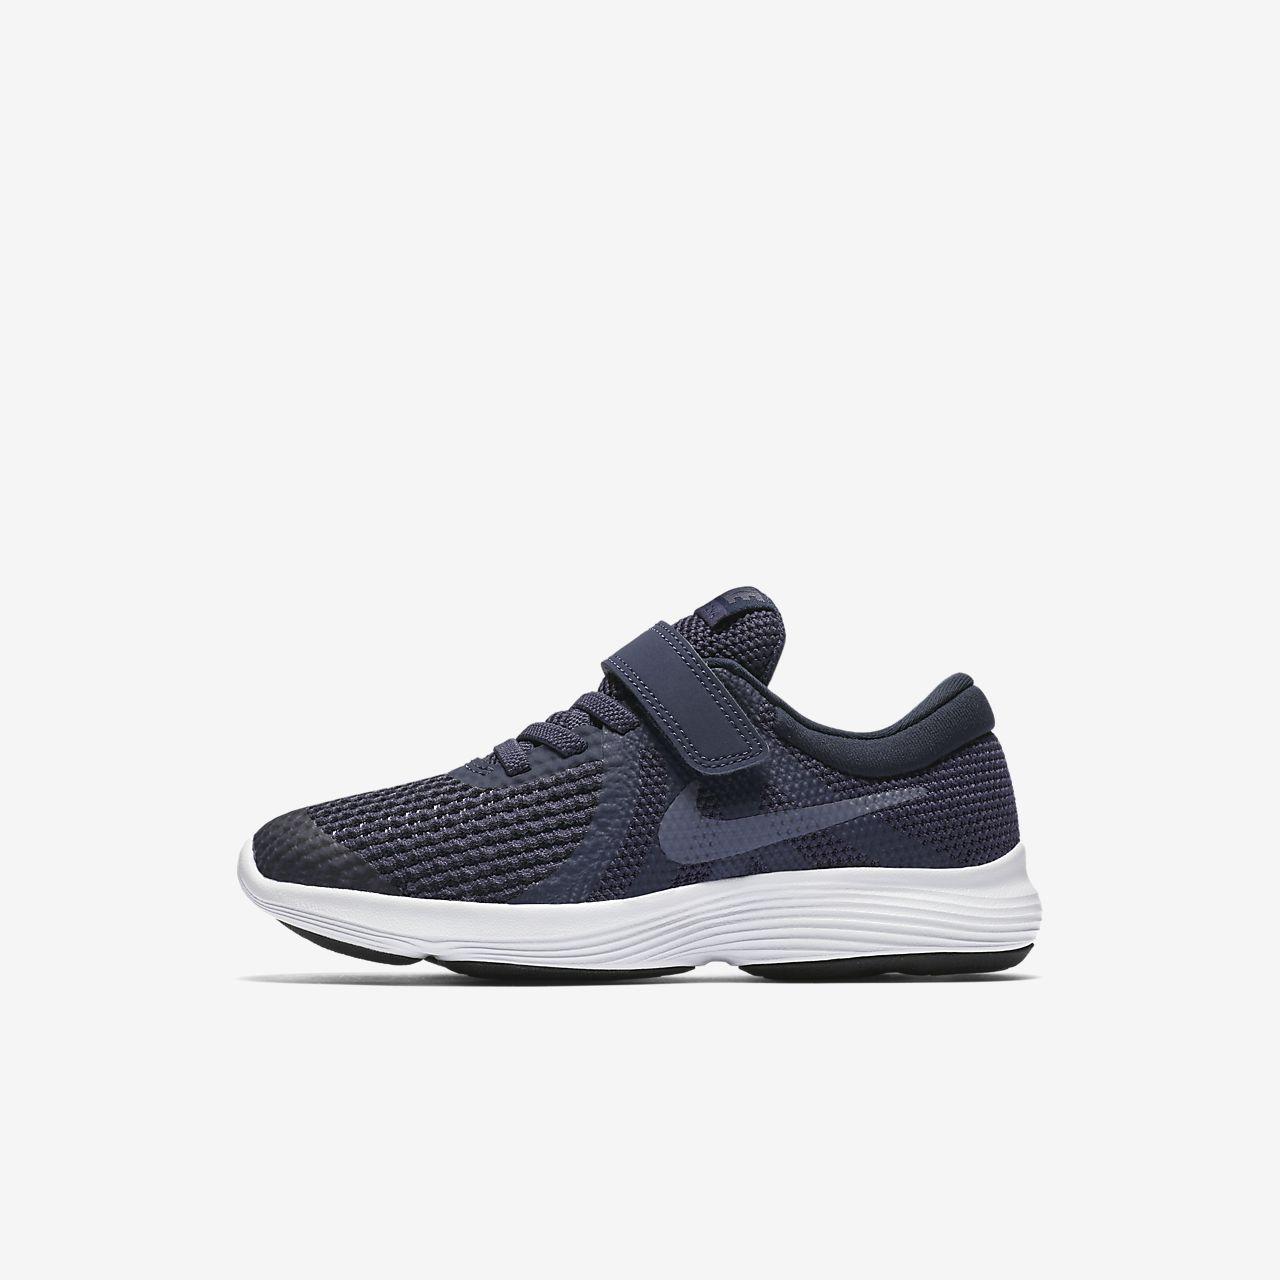 9f35a72ed8d Nike Revolution 4 Zapatillas - Niño a pequeño a. Nike.com ES